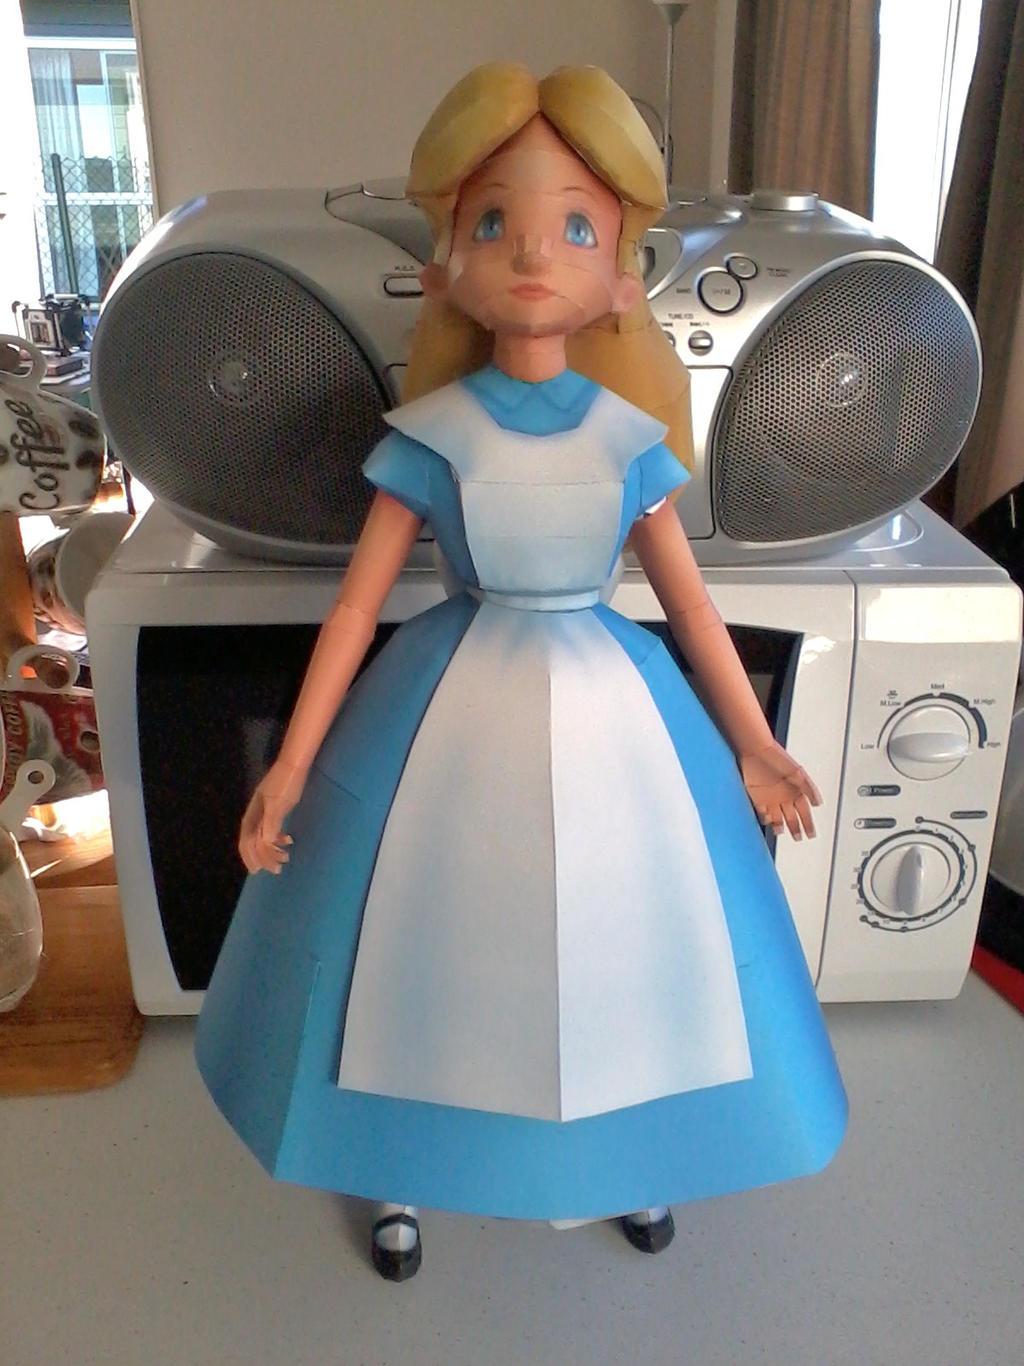 Alice in wonderland papercraft by x0xchelseax0x on deviantart for Alice in wonderland crafts